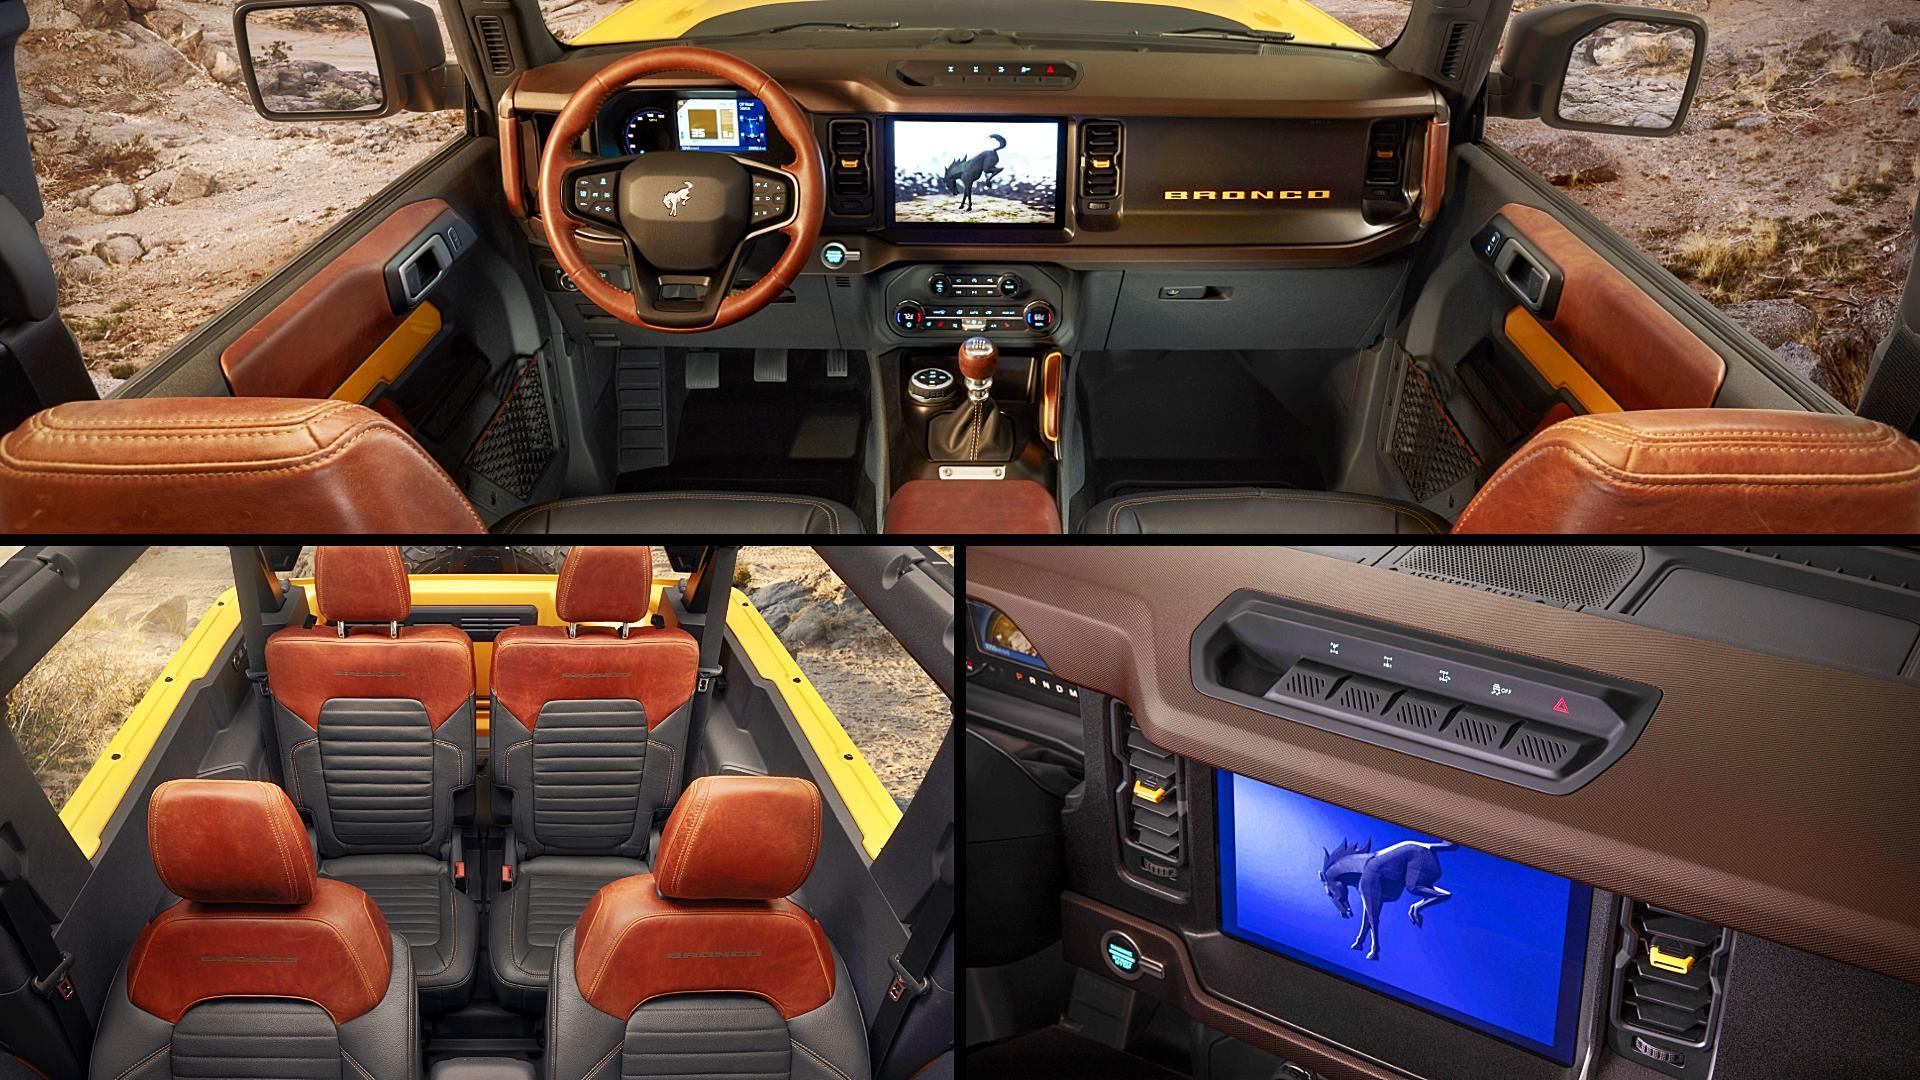 2021 Ford Bronco 2 Door Interior Inside